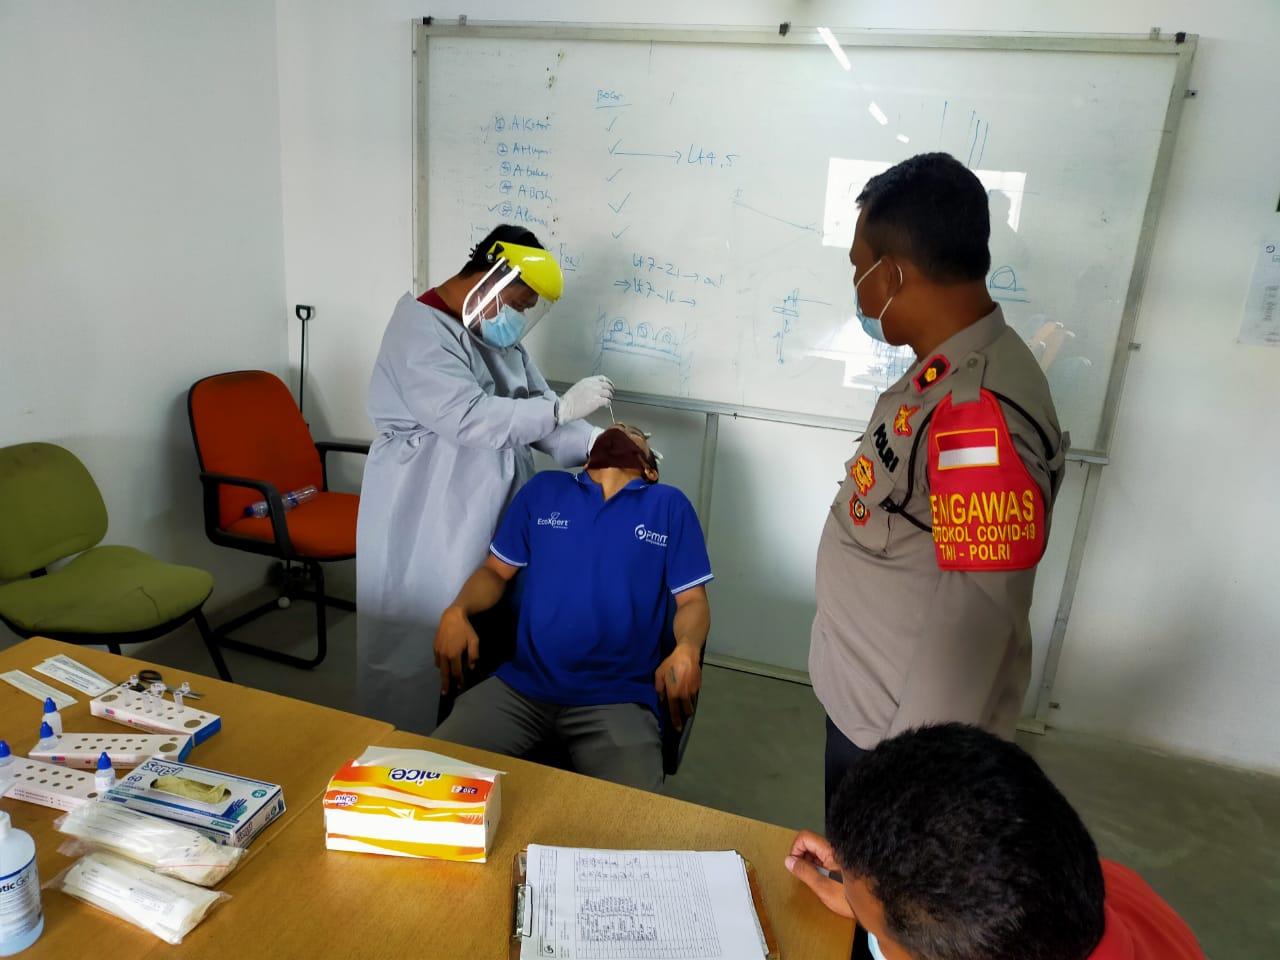 Pelaksanaan swab antigen bagi karyawan PT. Wijaya Kusuma Contractor di Hotel Nuanza yang berada di Ruko Cikarang Square, Desa Pasirsari, Kecamatan Cikarang Selatan, Kabupaten Bekasi, pada Kamis (27/05/21) pagi.